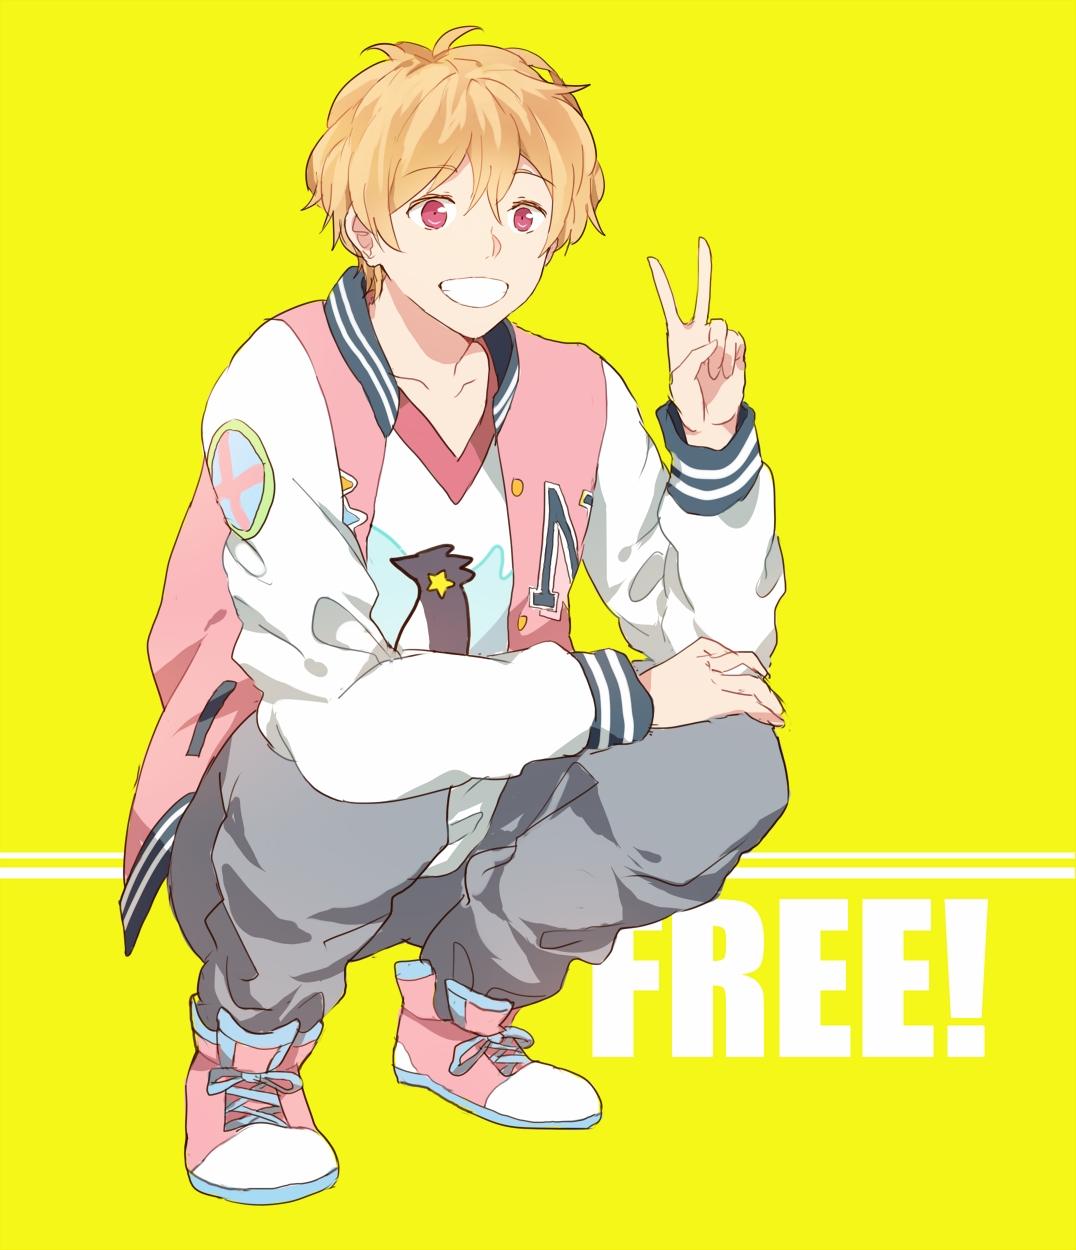 Free Nagisa Hazuki Ending Pink Baseball Cosplay Costume Laddypan